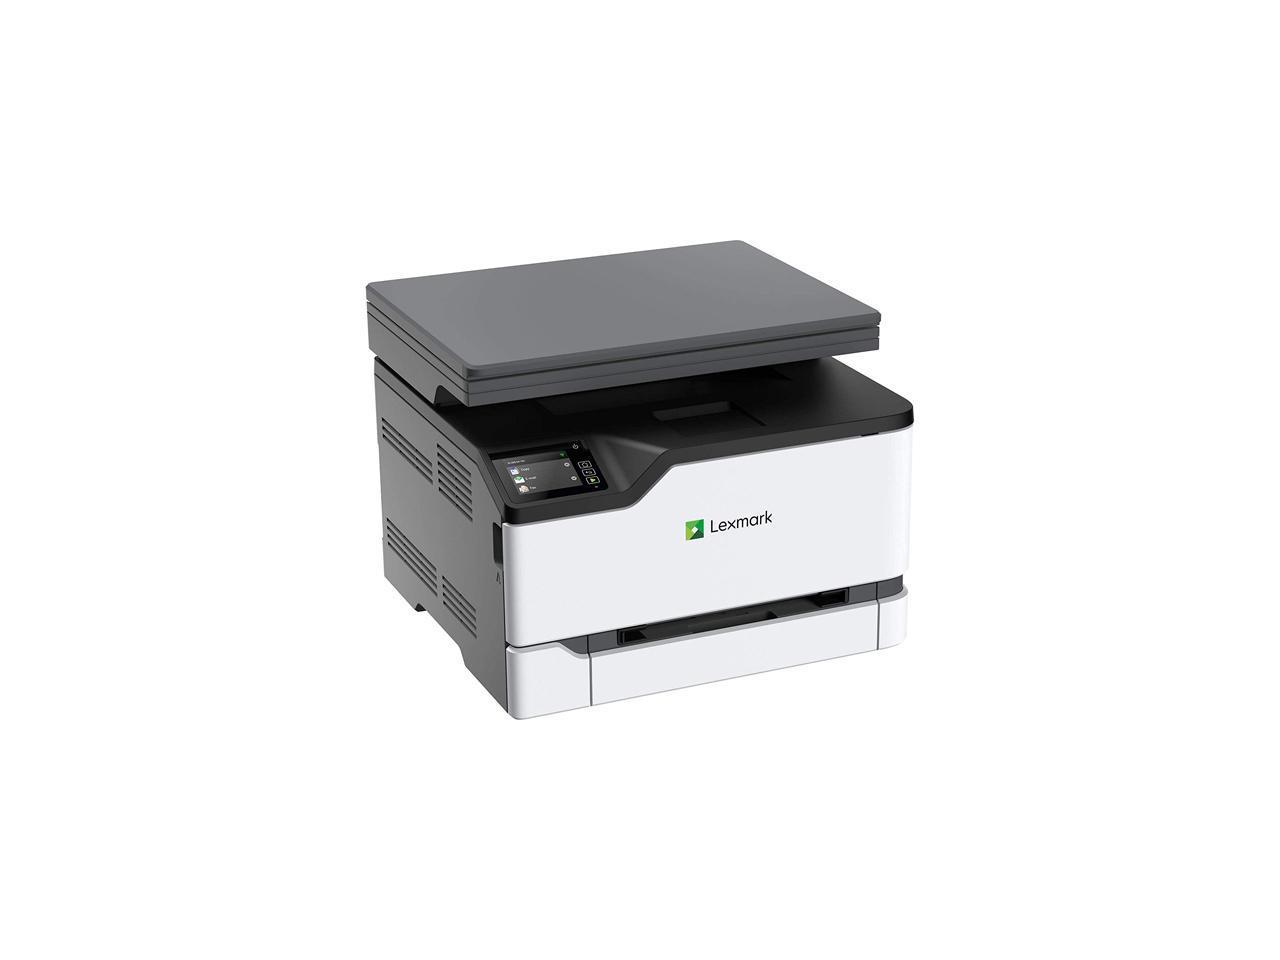 40g//Bottle,4 Black Refill Laser Copier Color Toner Powder Kits Kit for Lexmark X940 X945 X 940 945 Laser Printer